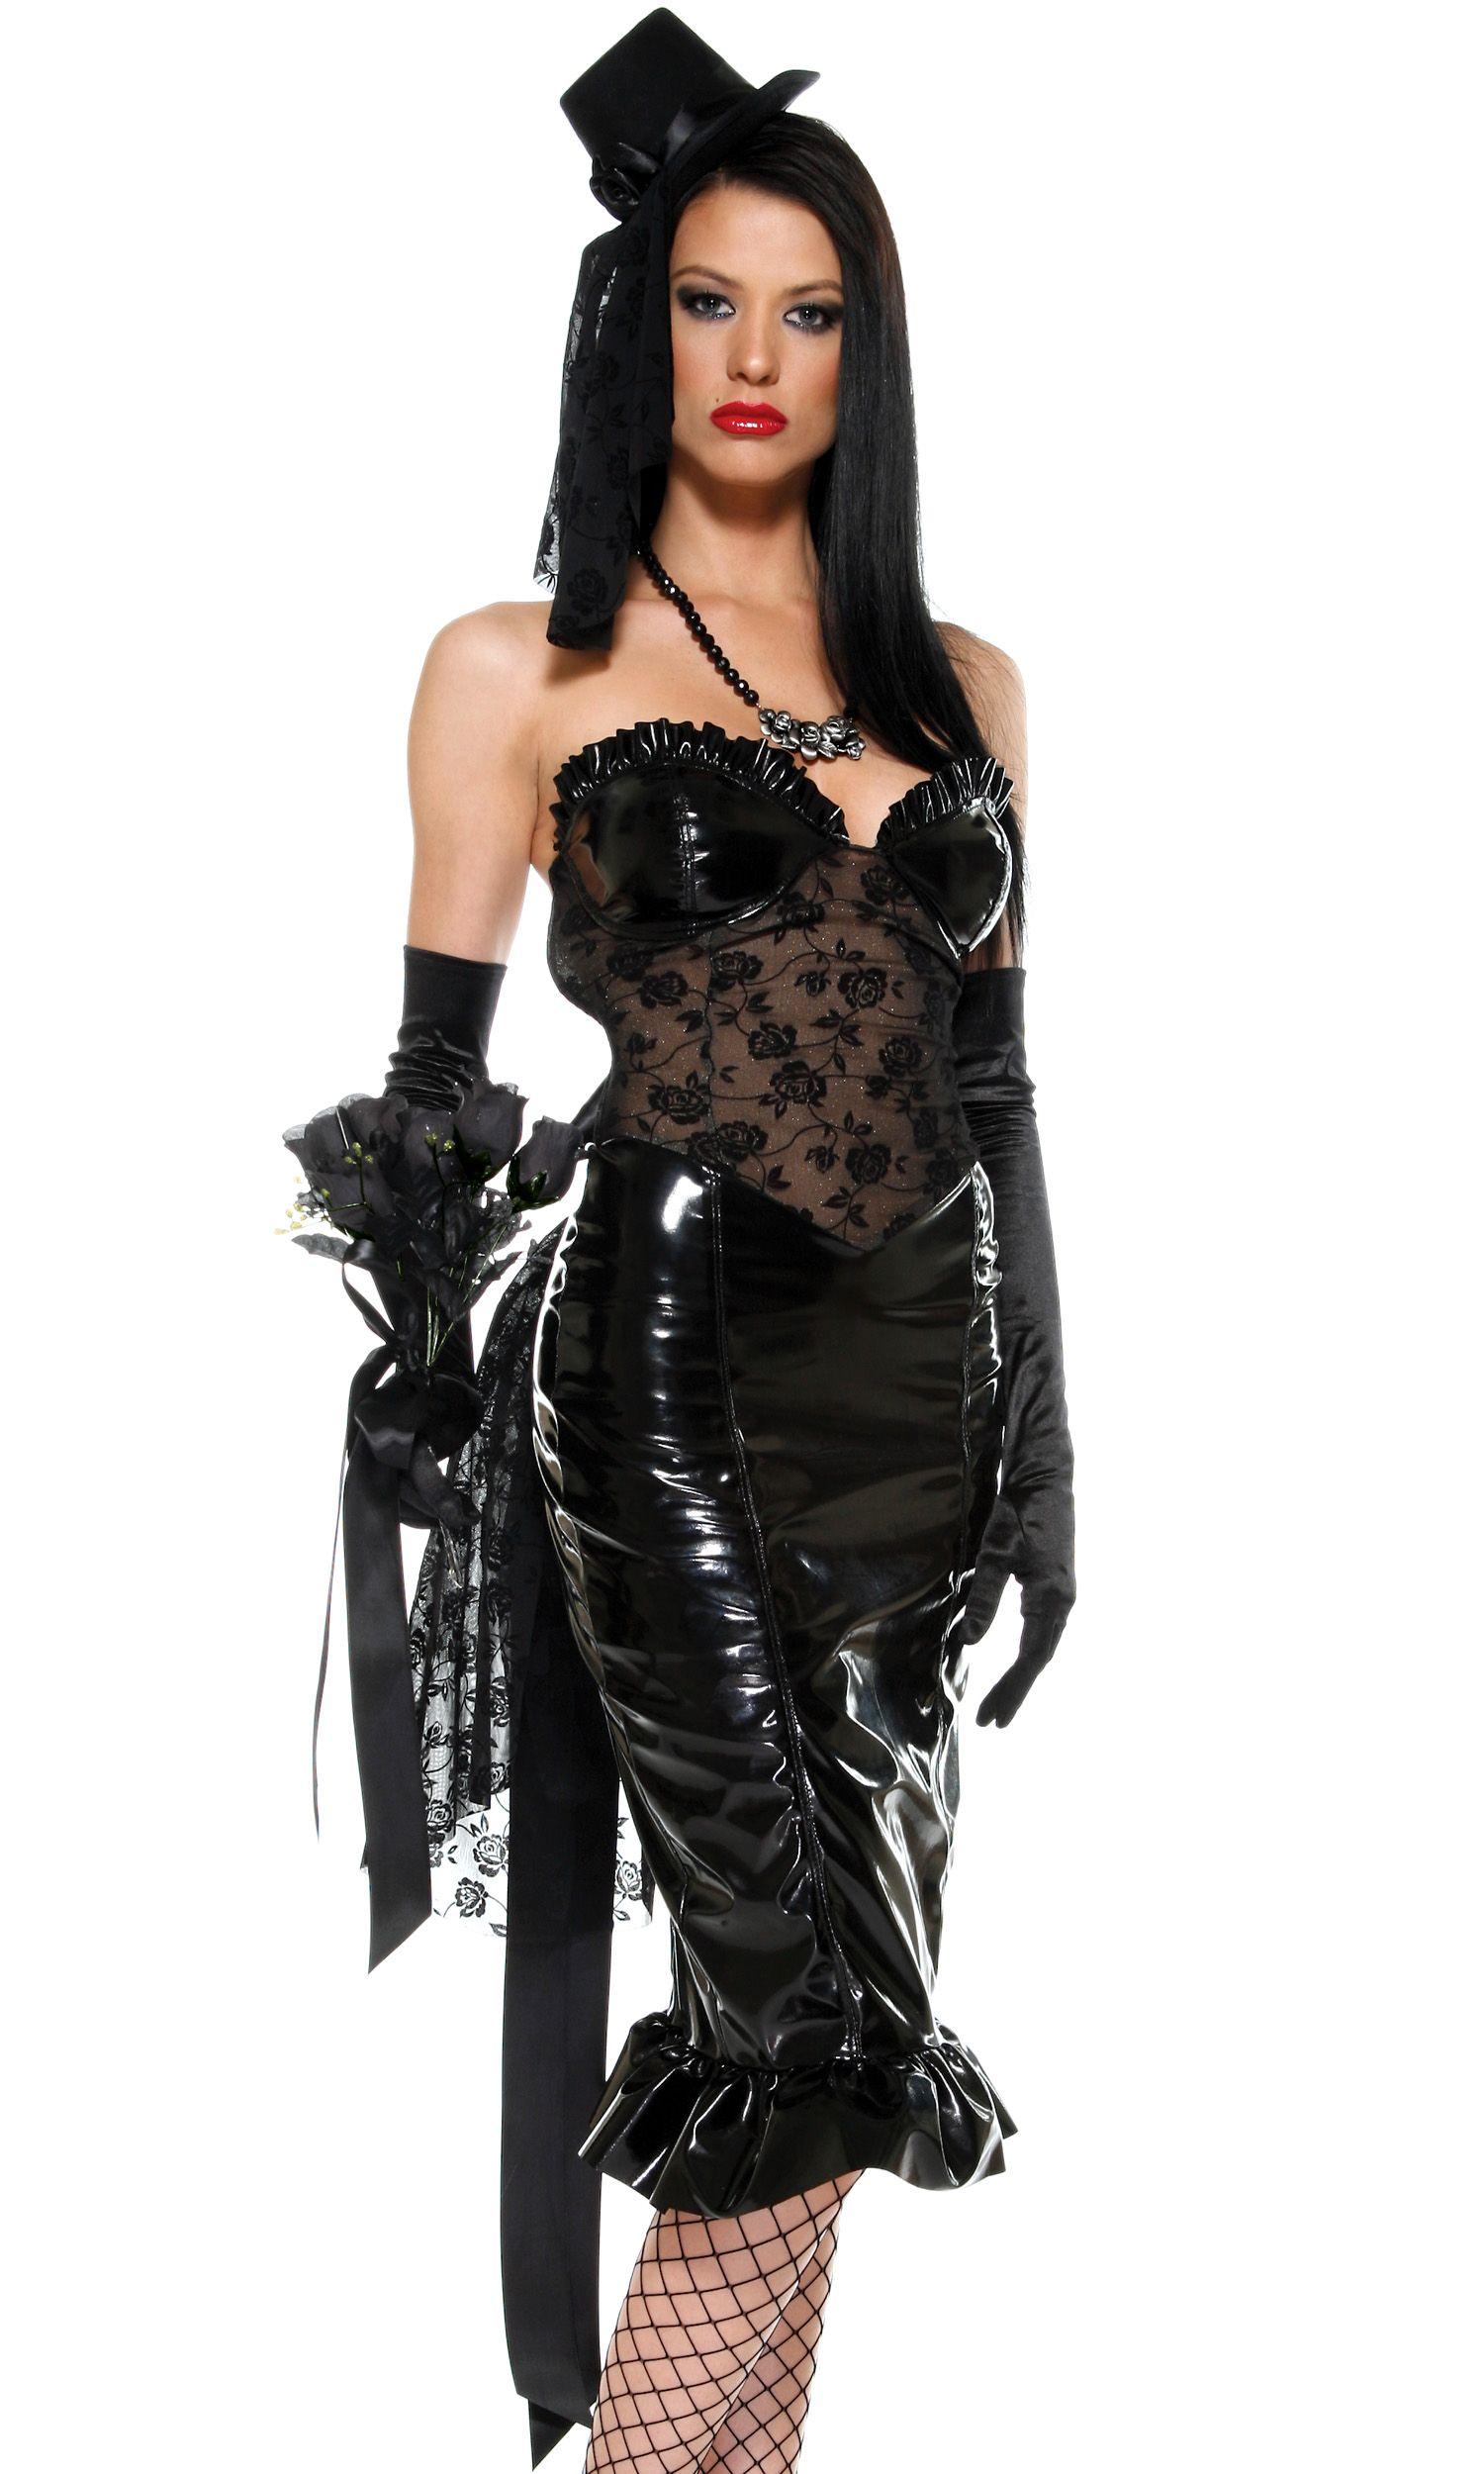 daa52ba8db ForPlay  Shop Gothic Bride Halloween Costume by Forplay Catalog